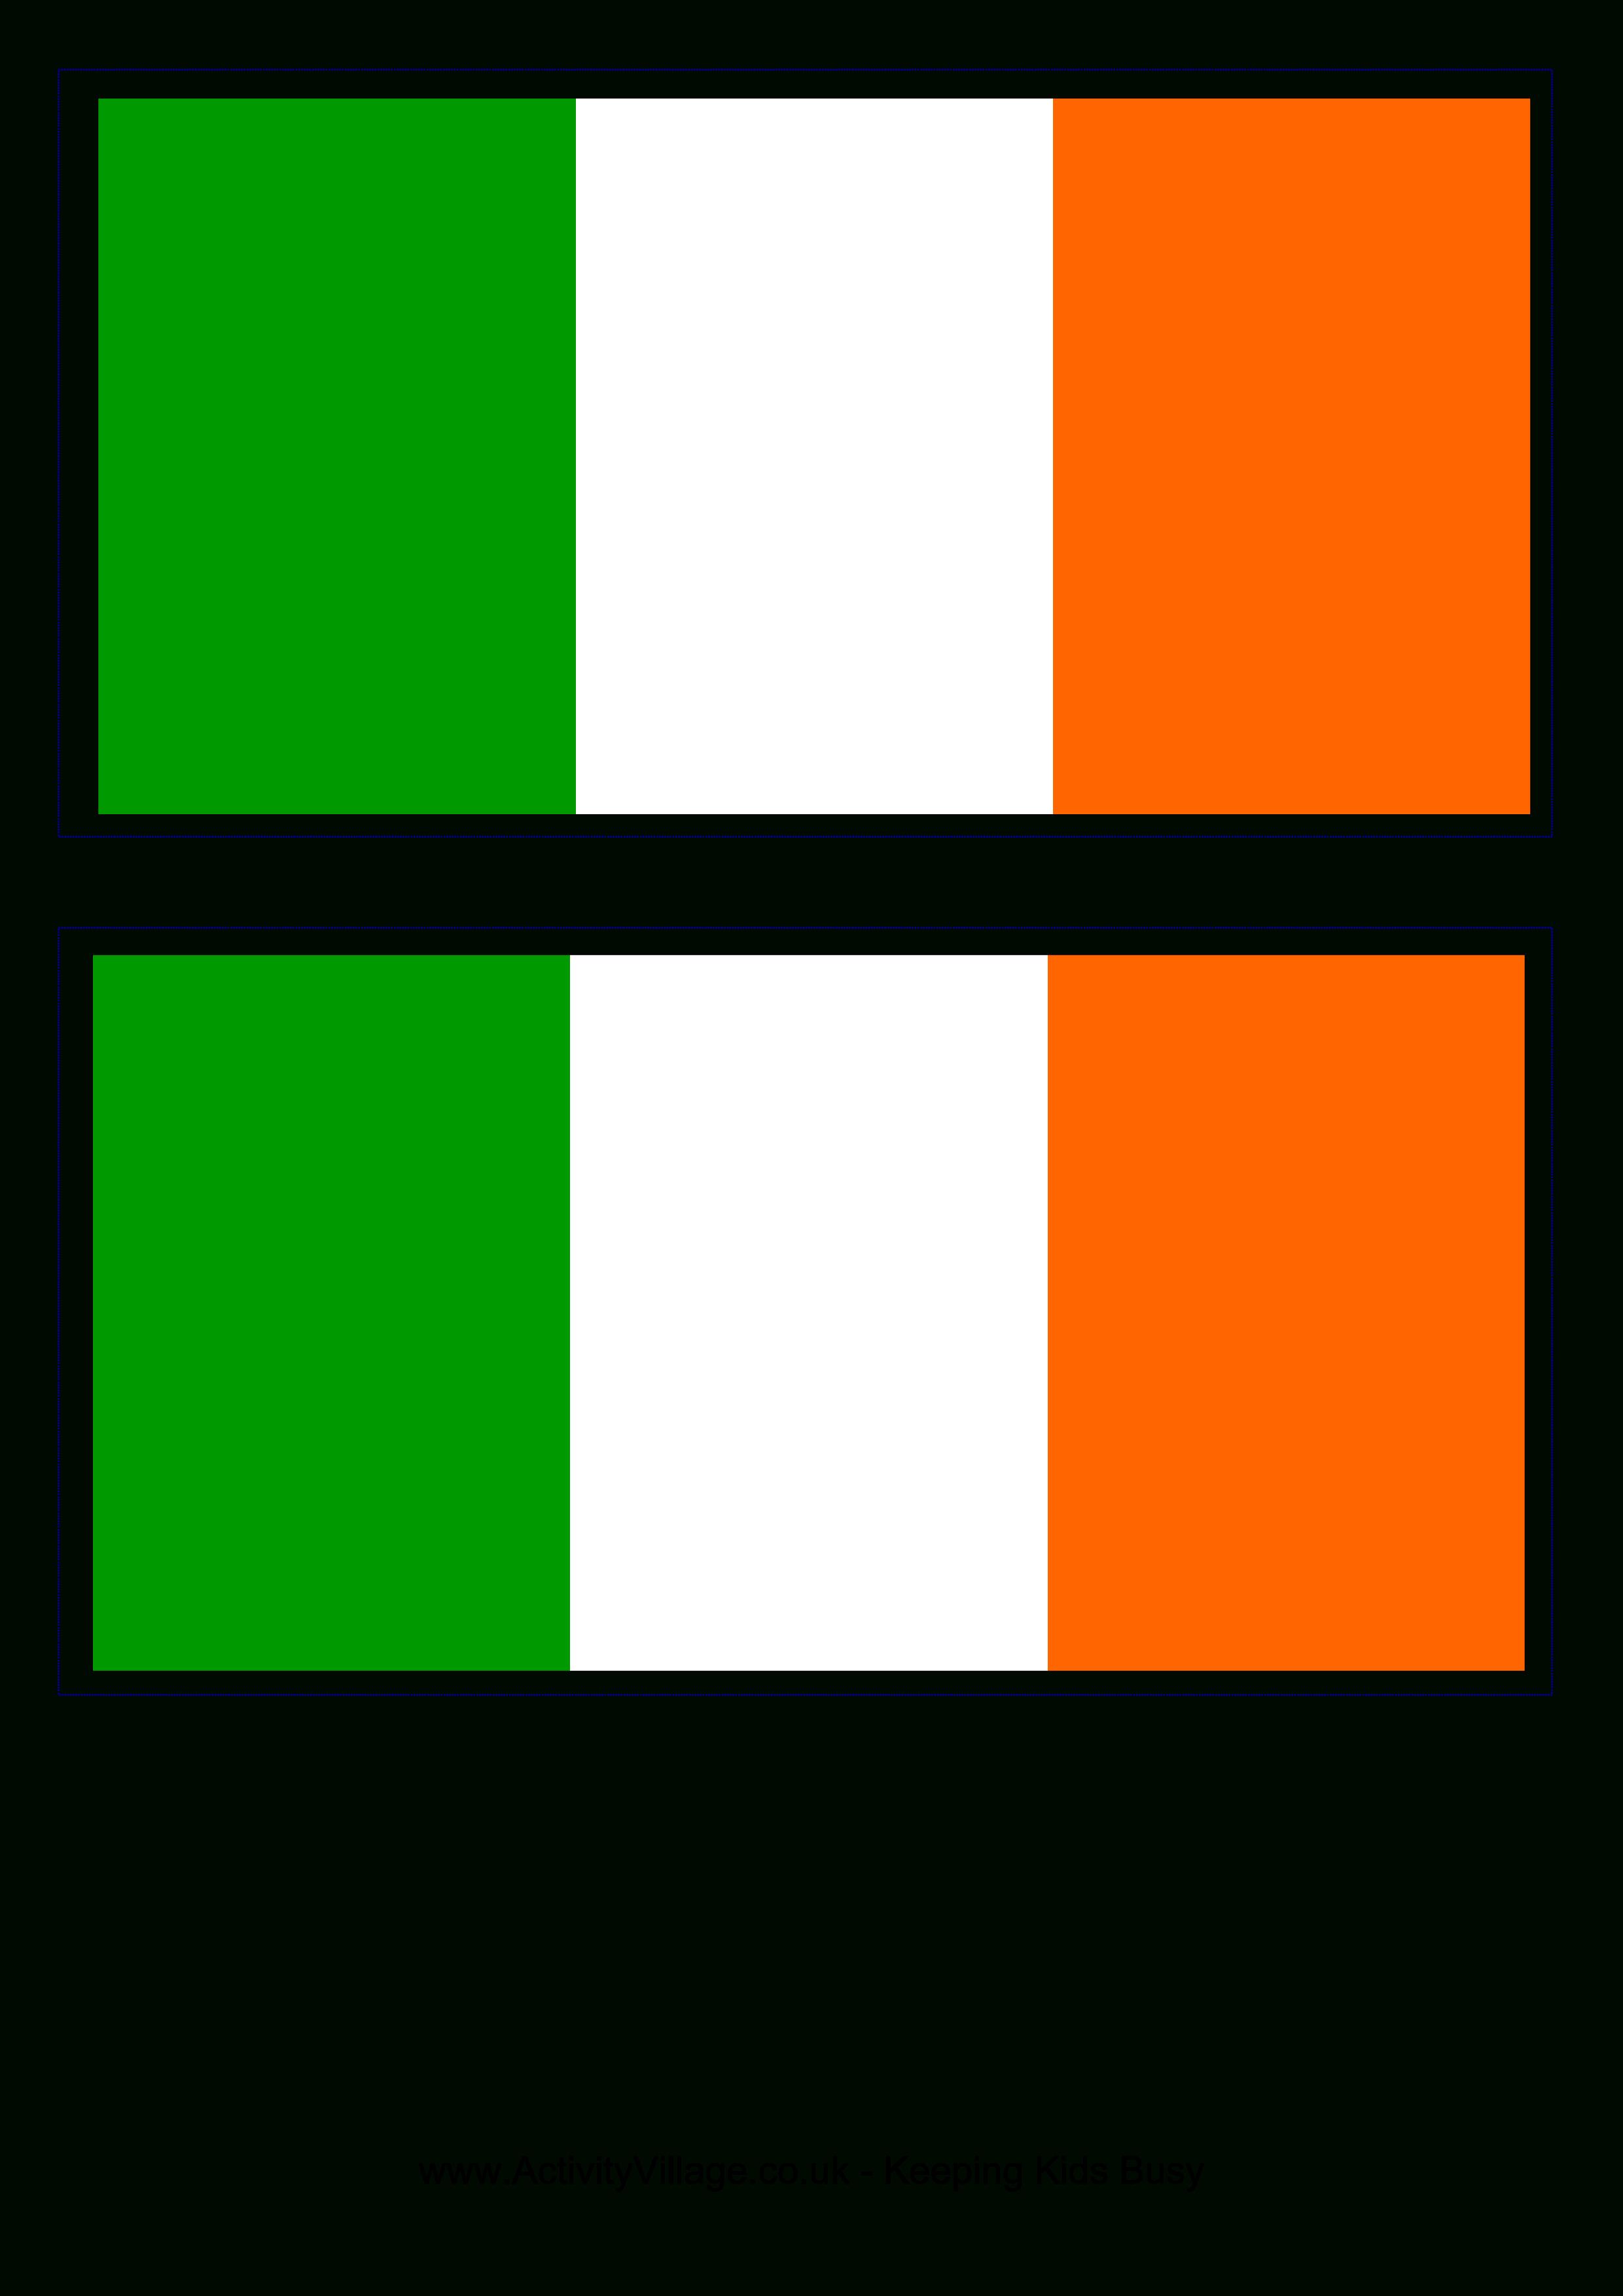 Irish Flag - Free Printable Irish Flag   When I'm Feelin Crafty - Free Printable Scottish Flag